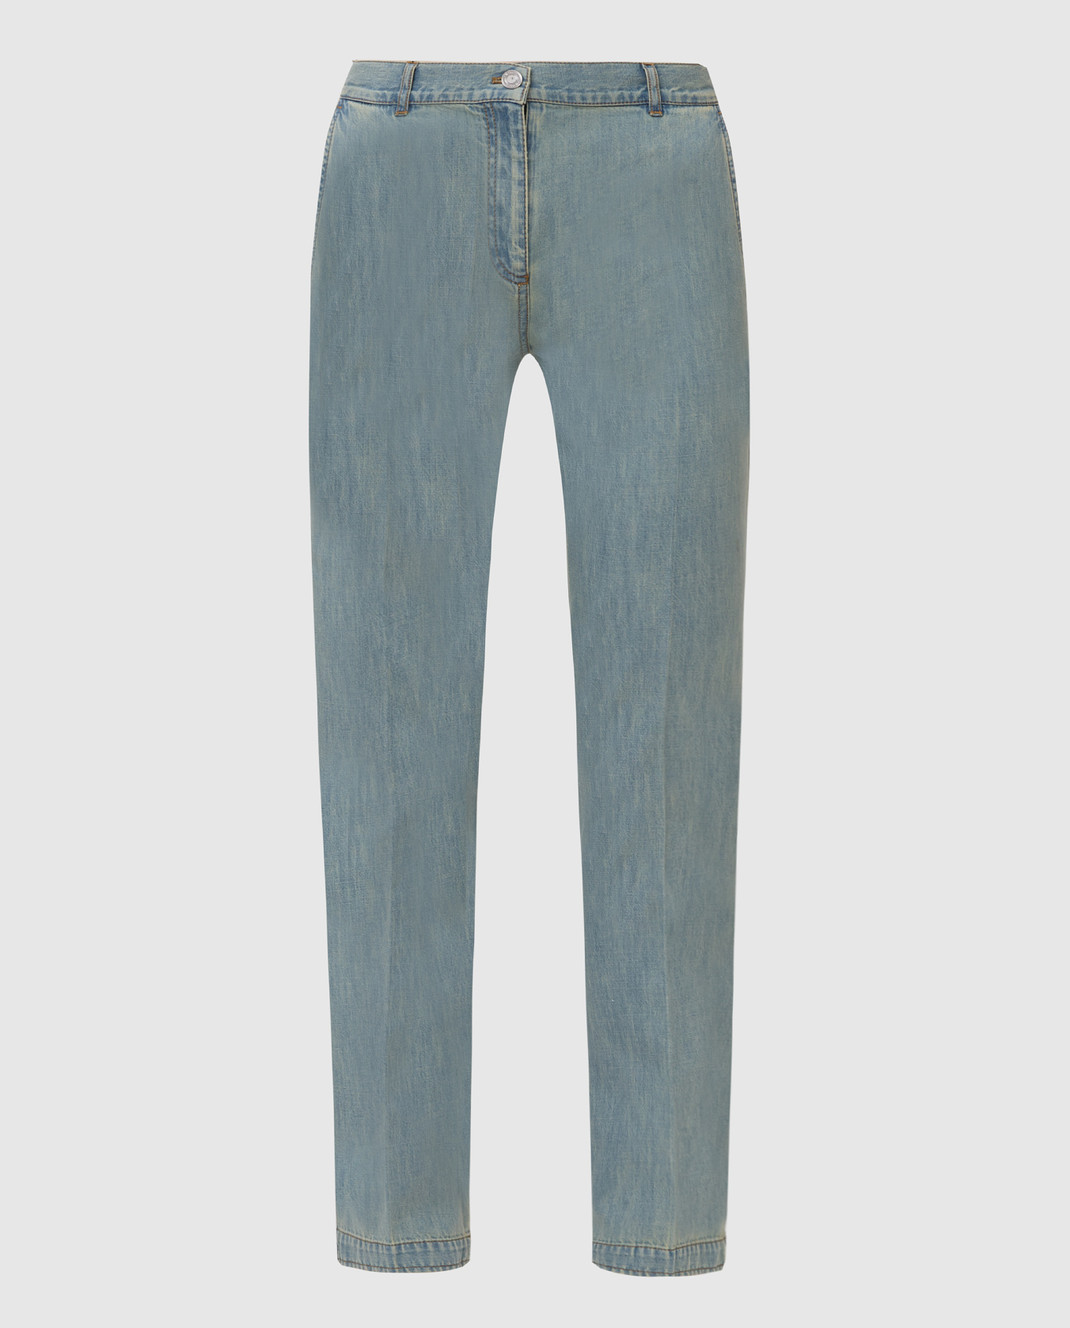 Bottega Veneta Голубые джинсы 545211